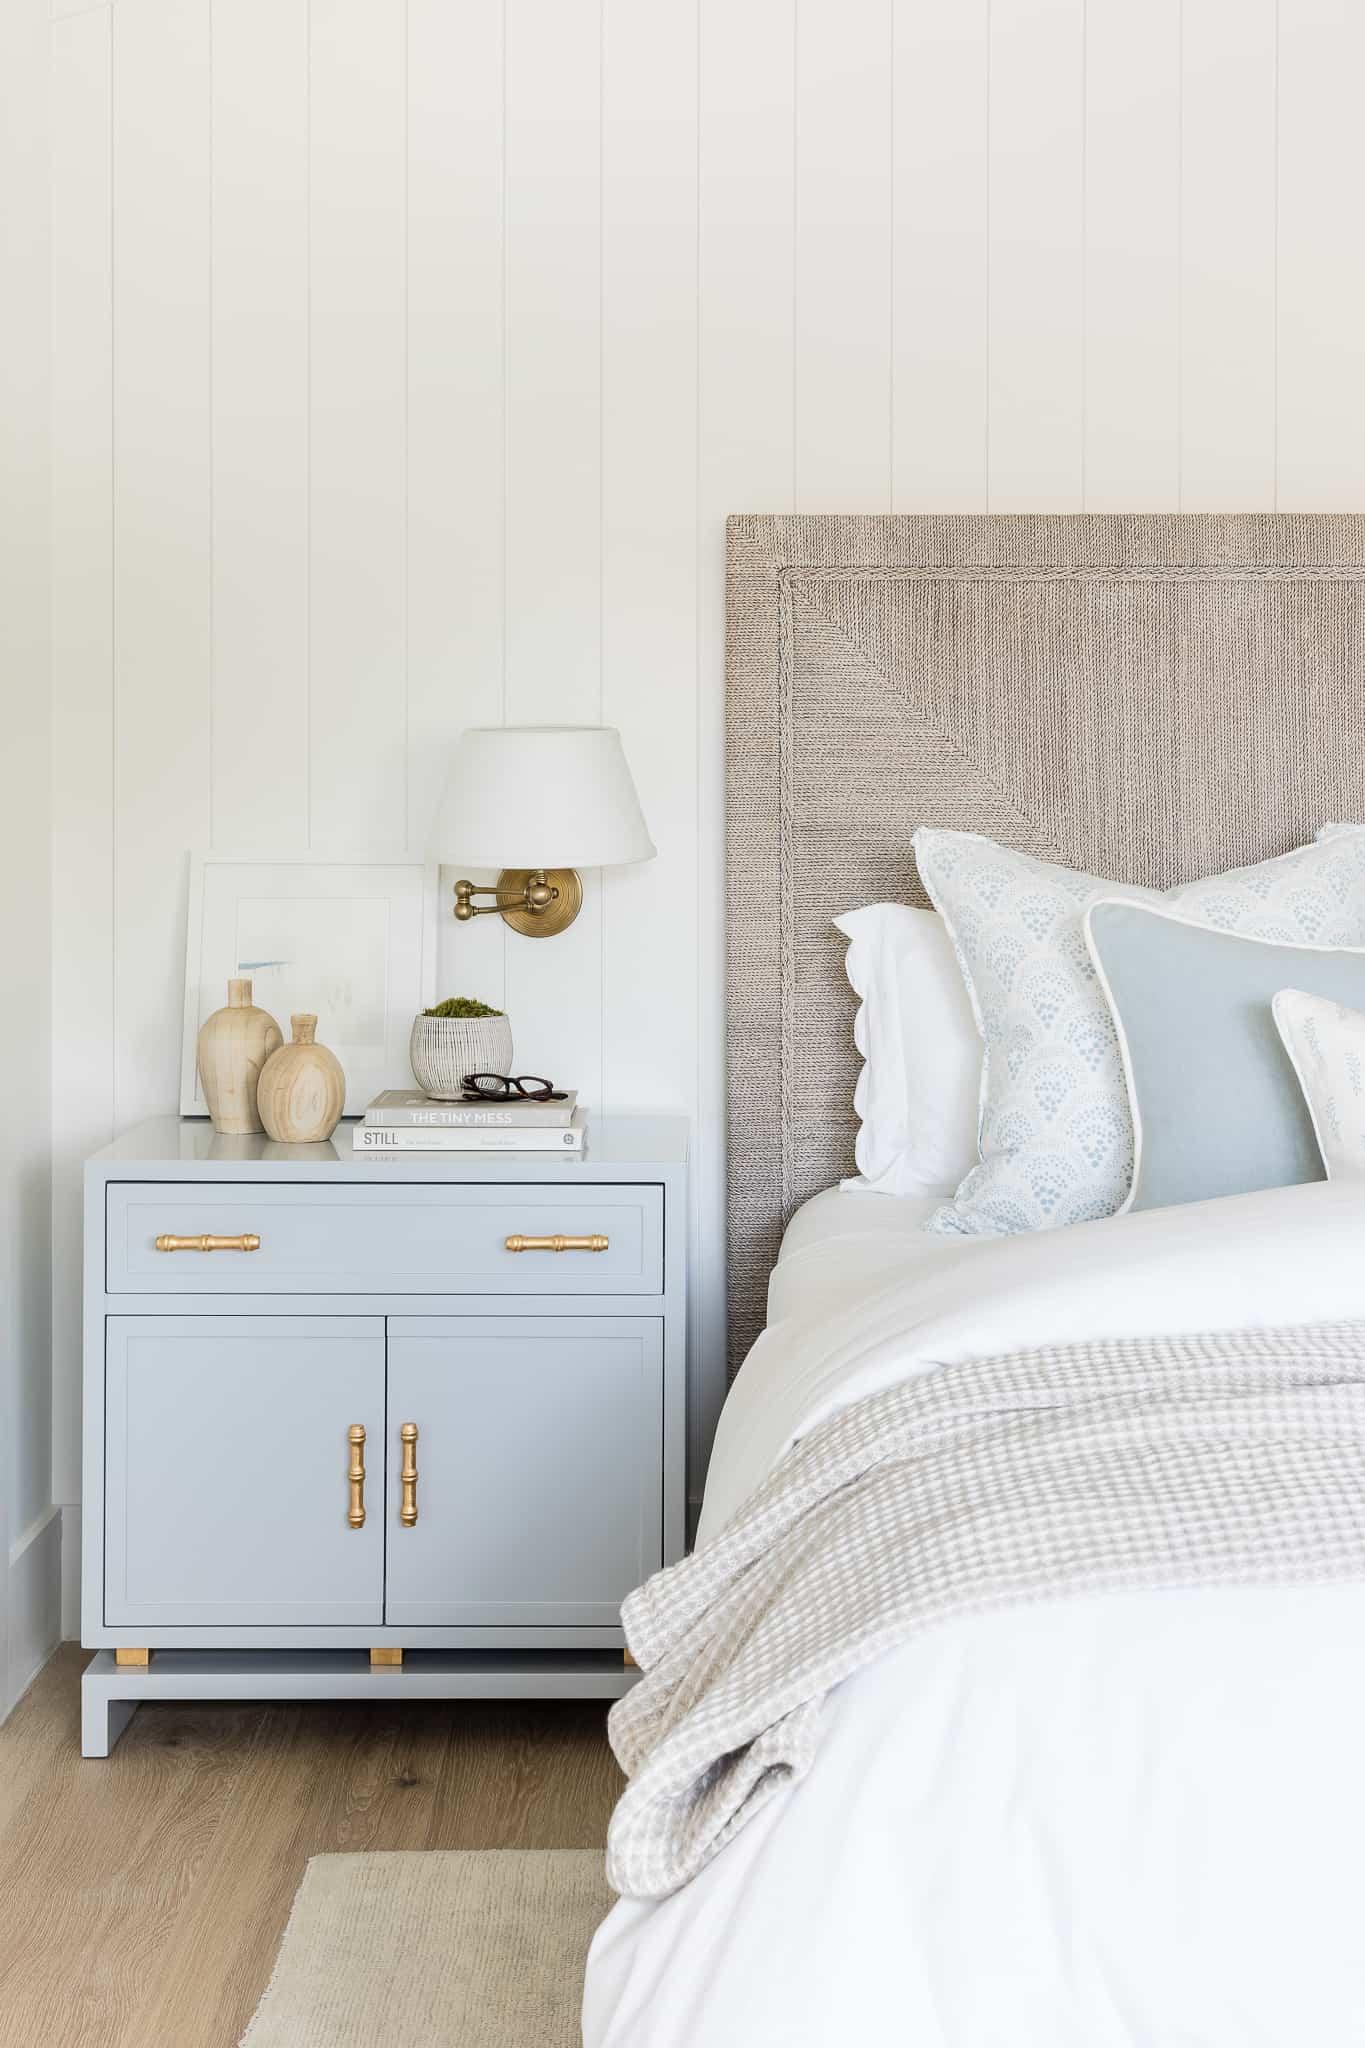 Coastal Bedroom Design - Port Newport Project - Mindy Gayer Design Co.